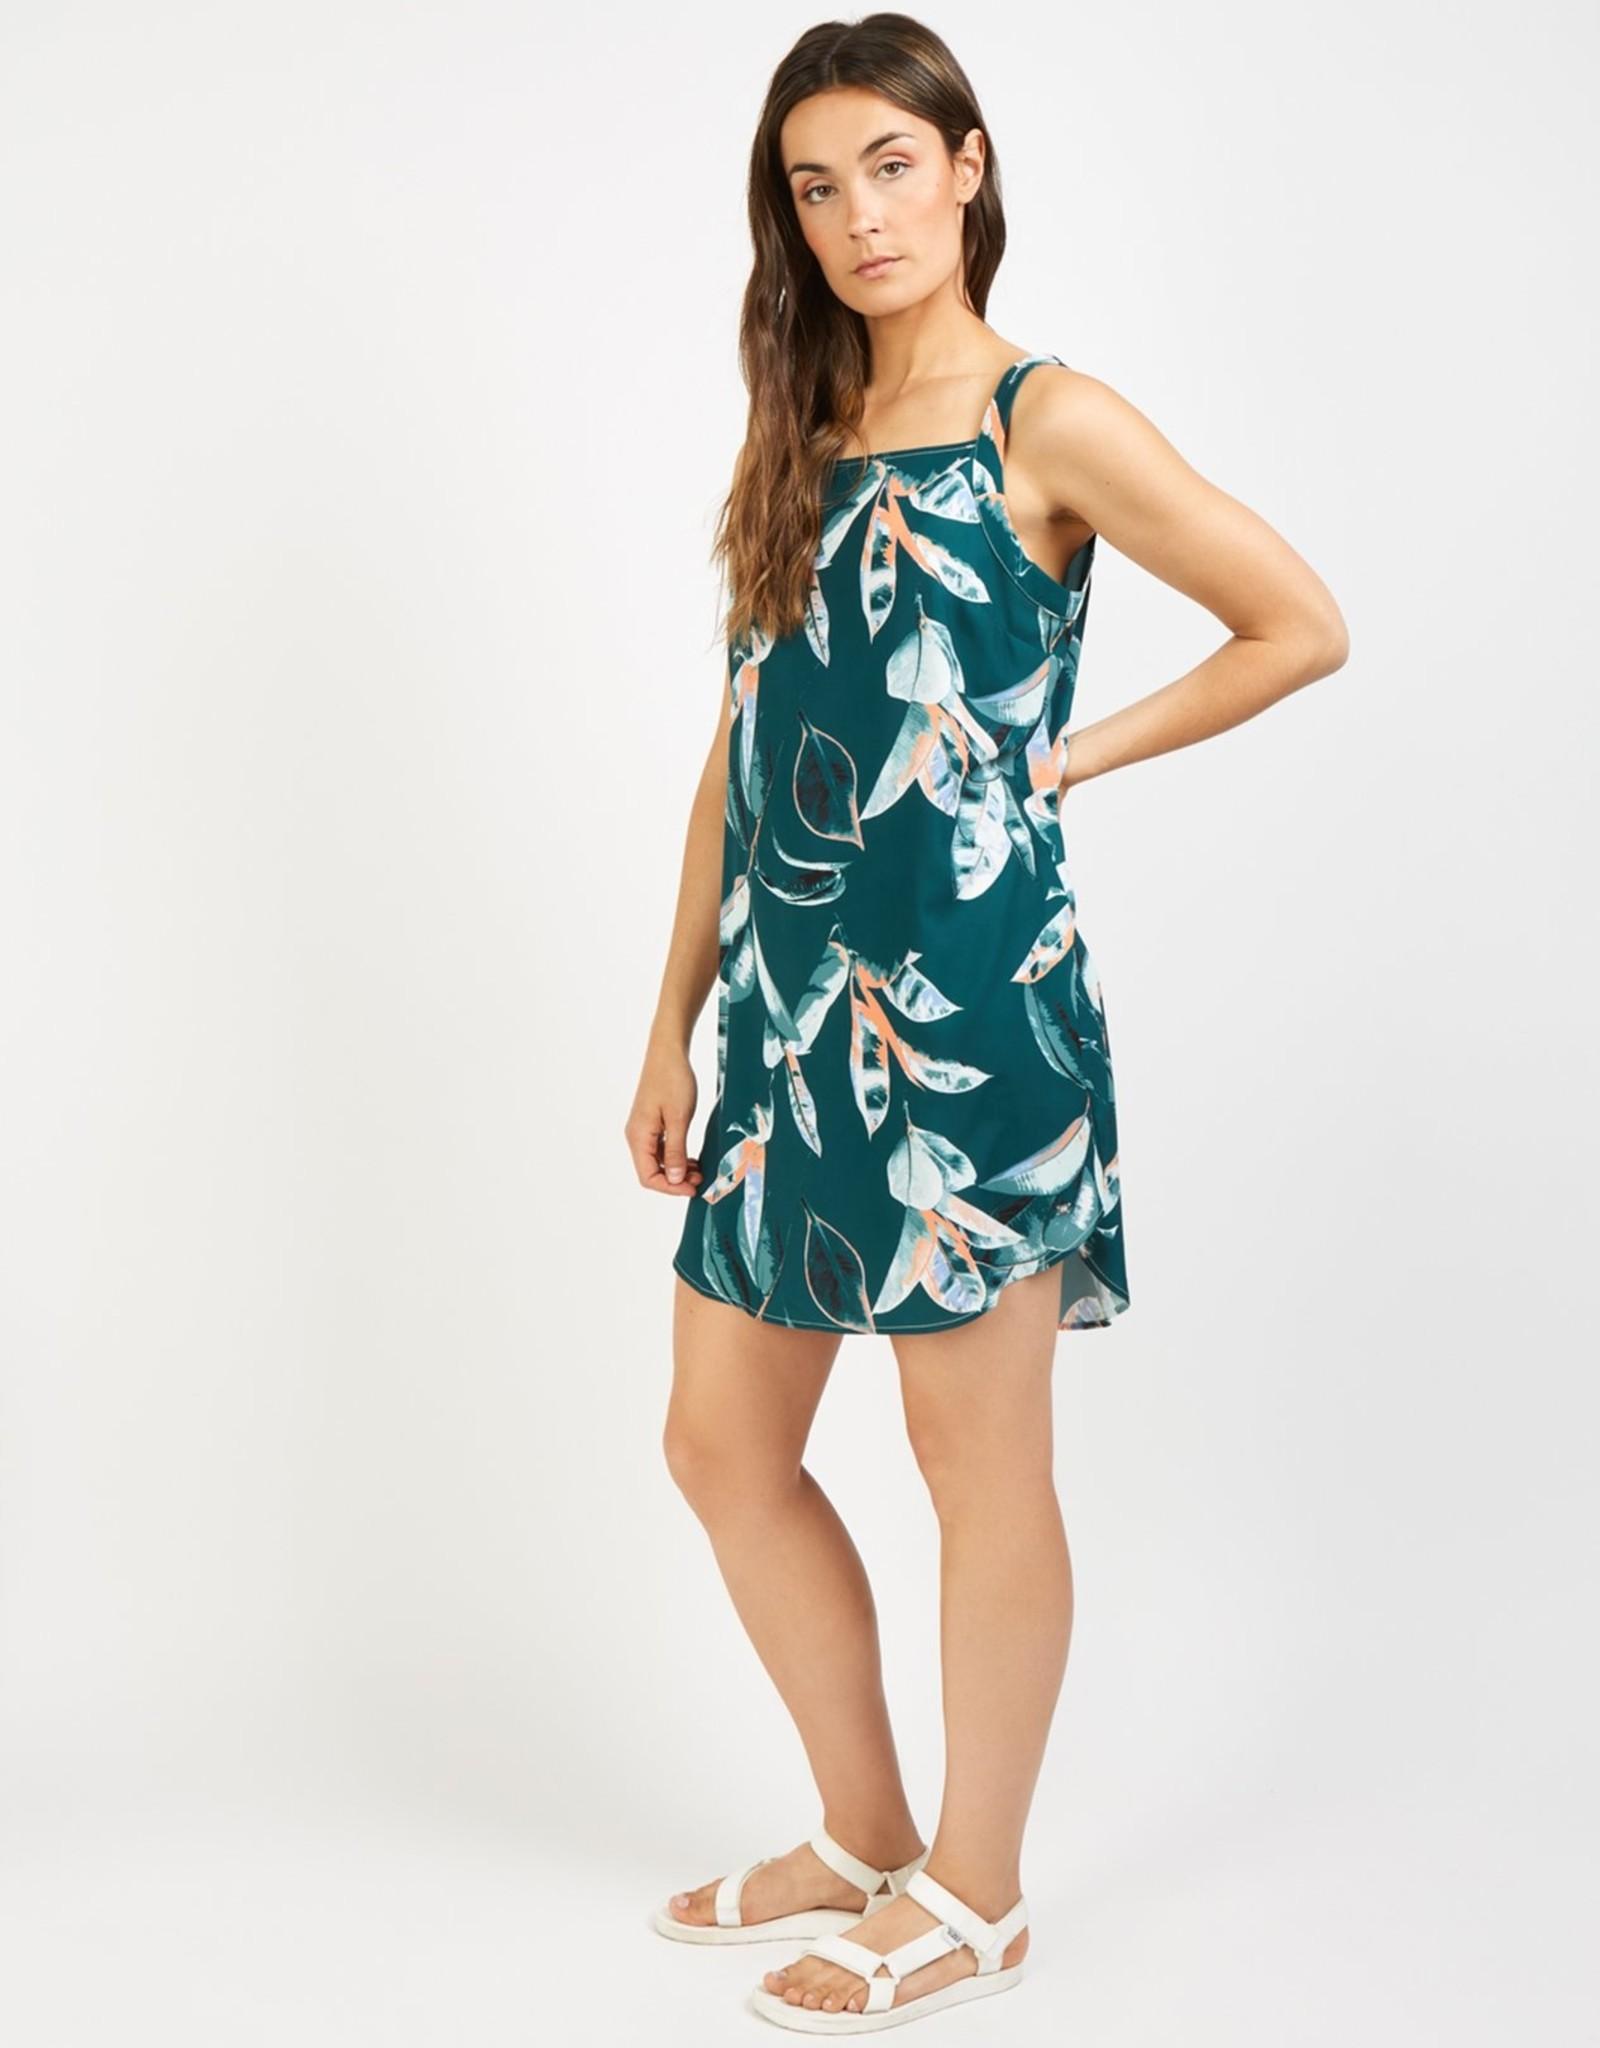 FIG Aruba Dress